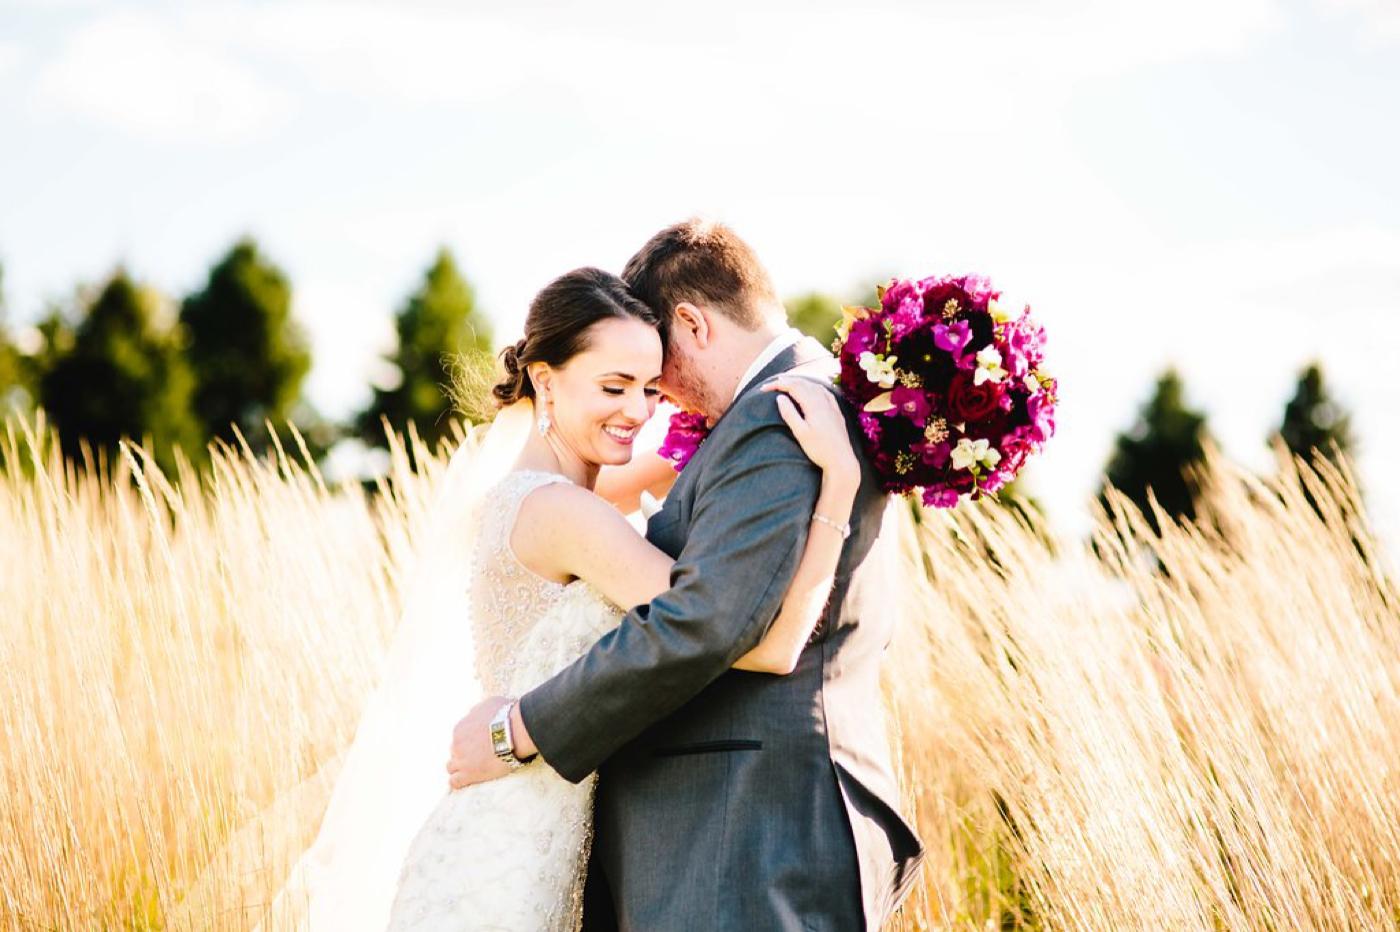 chicago-fine-art-wedding-photography-wood24